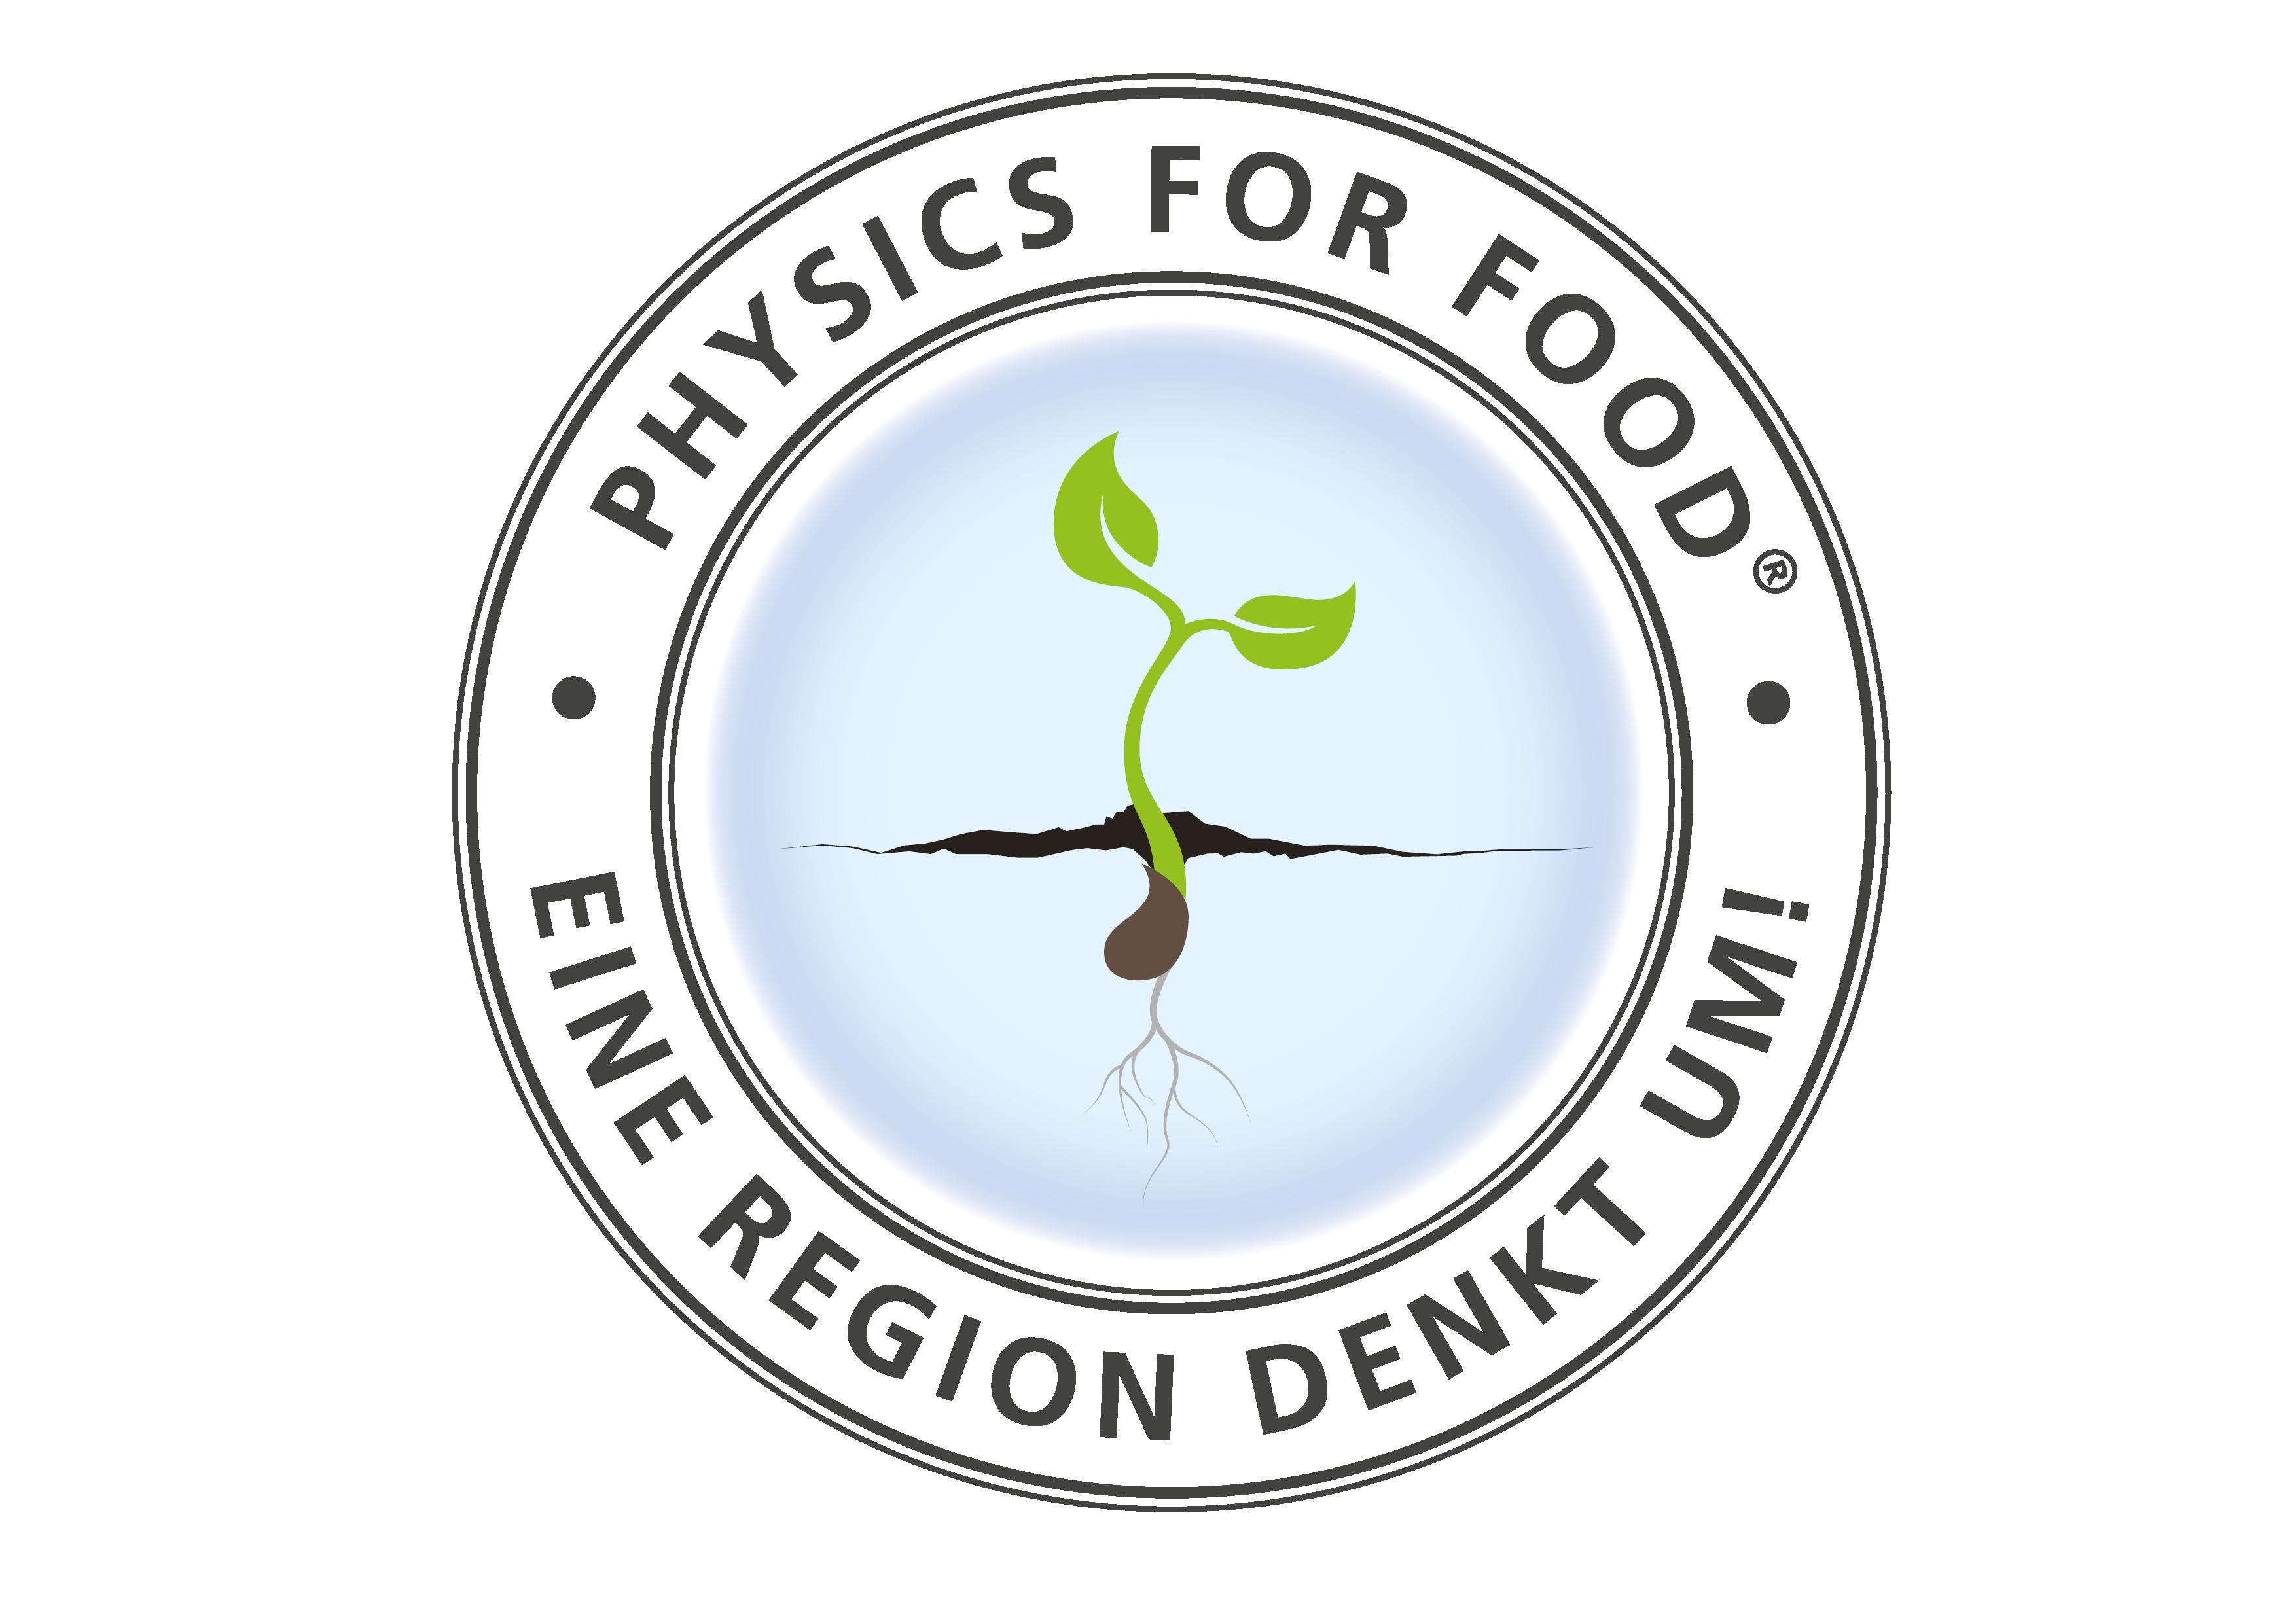 Physics For Food Logo 2